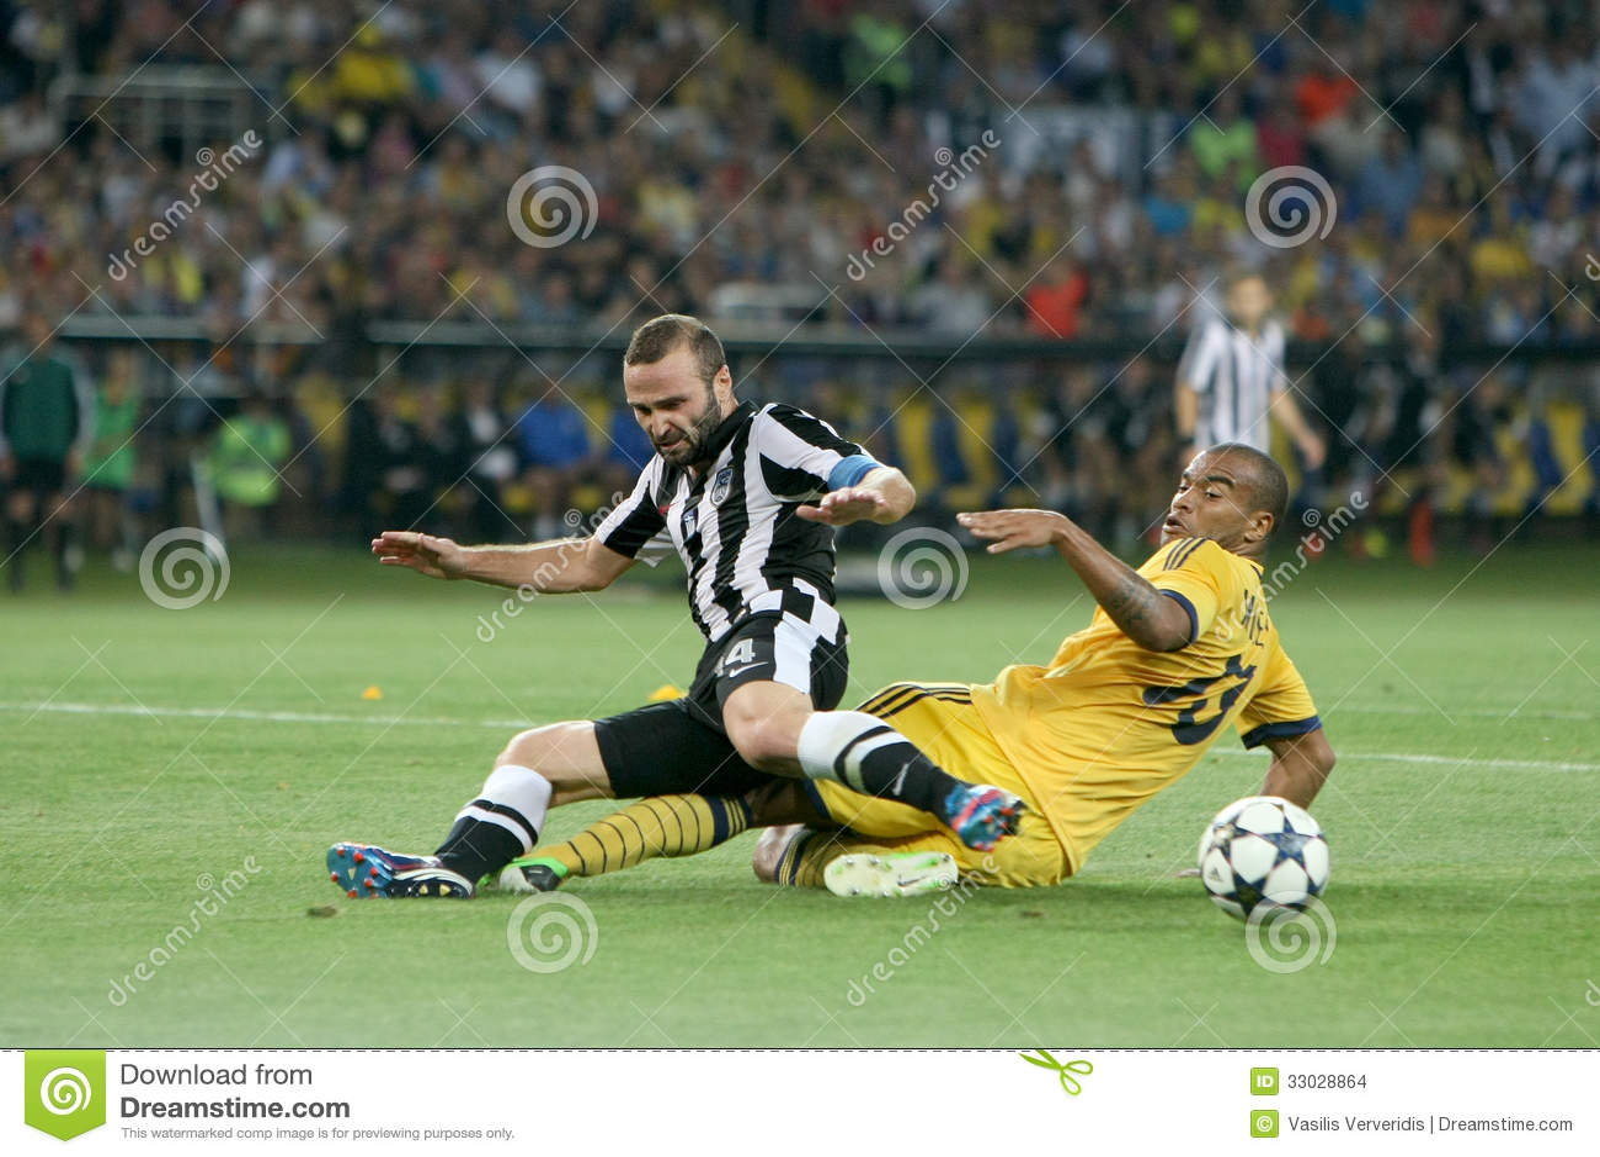 Meczu piłkarskiego metalist vs paok